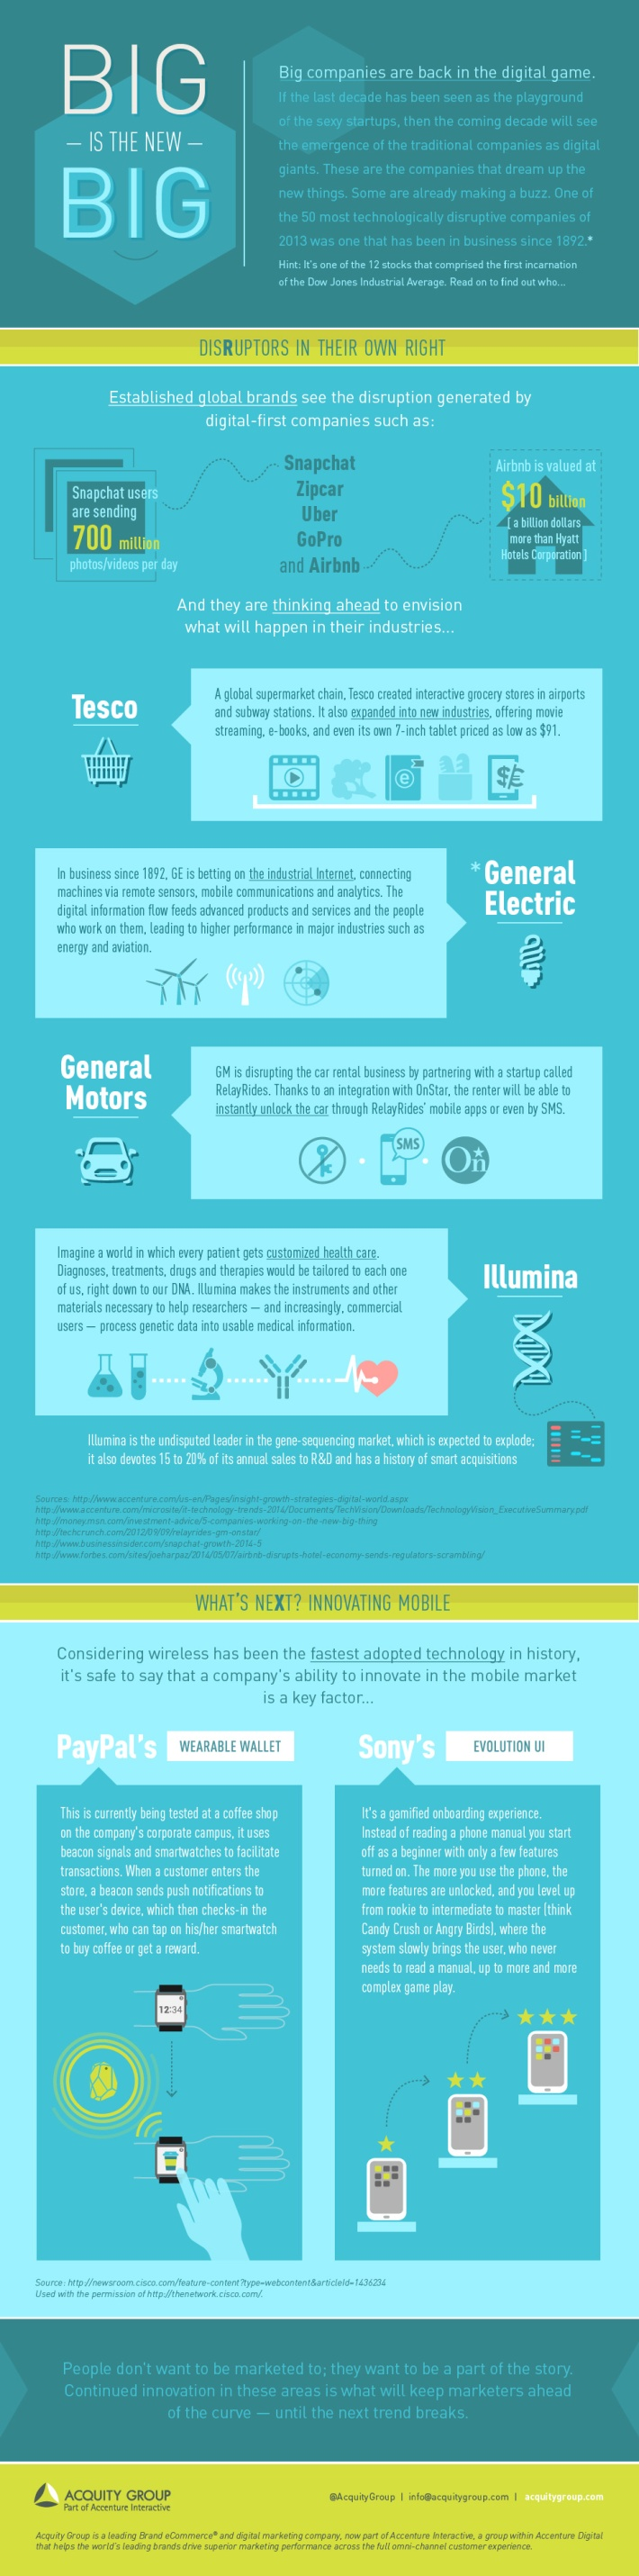 Big-is-theNewBig-infographic_f2